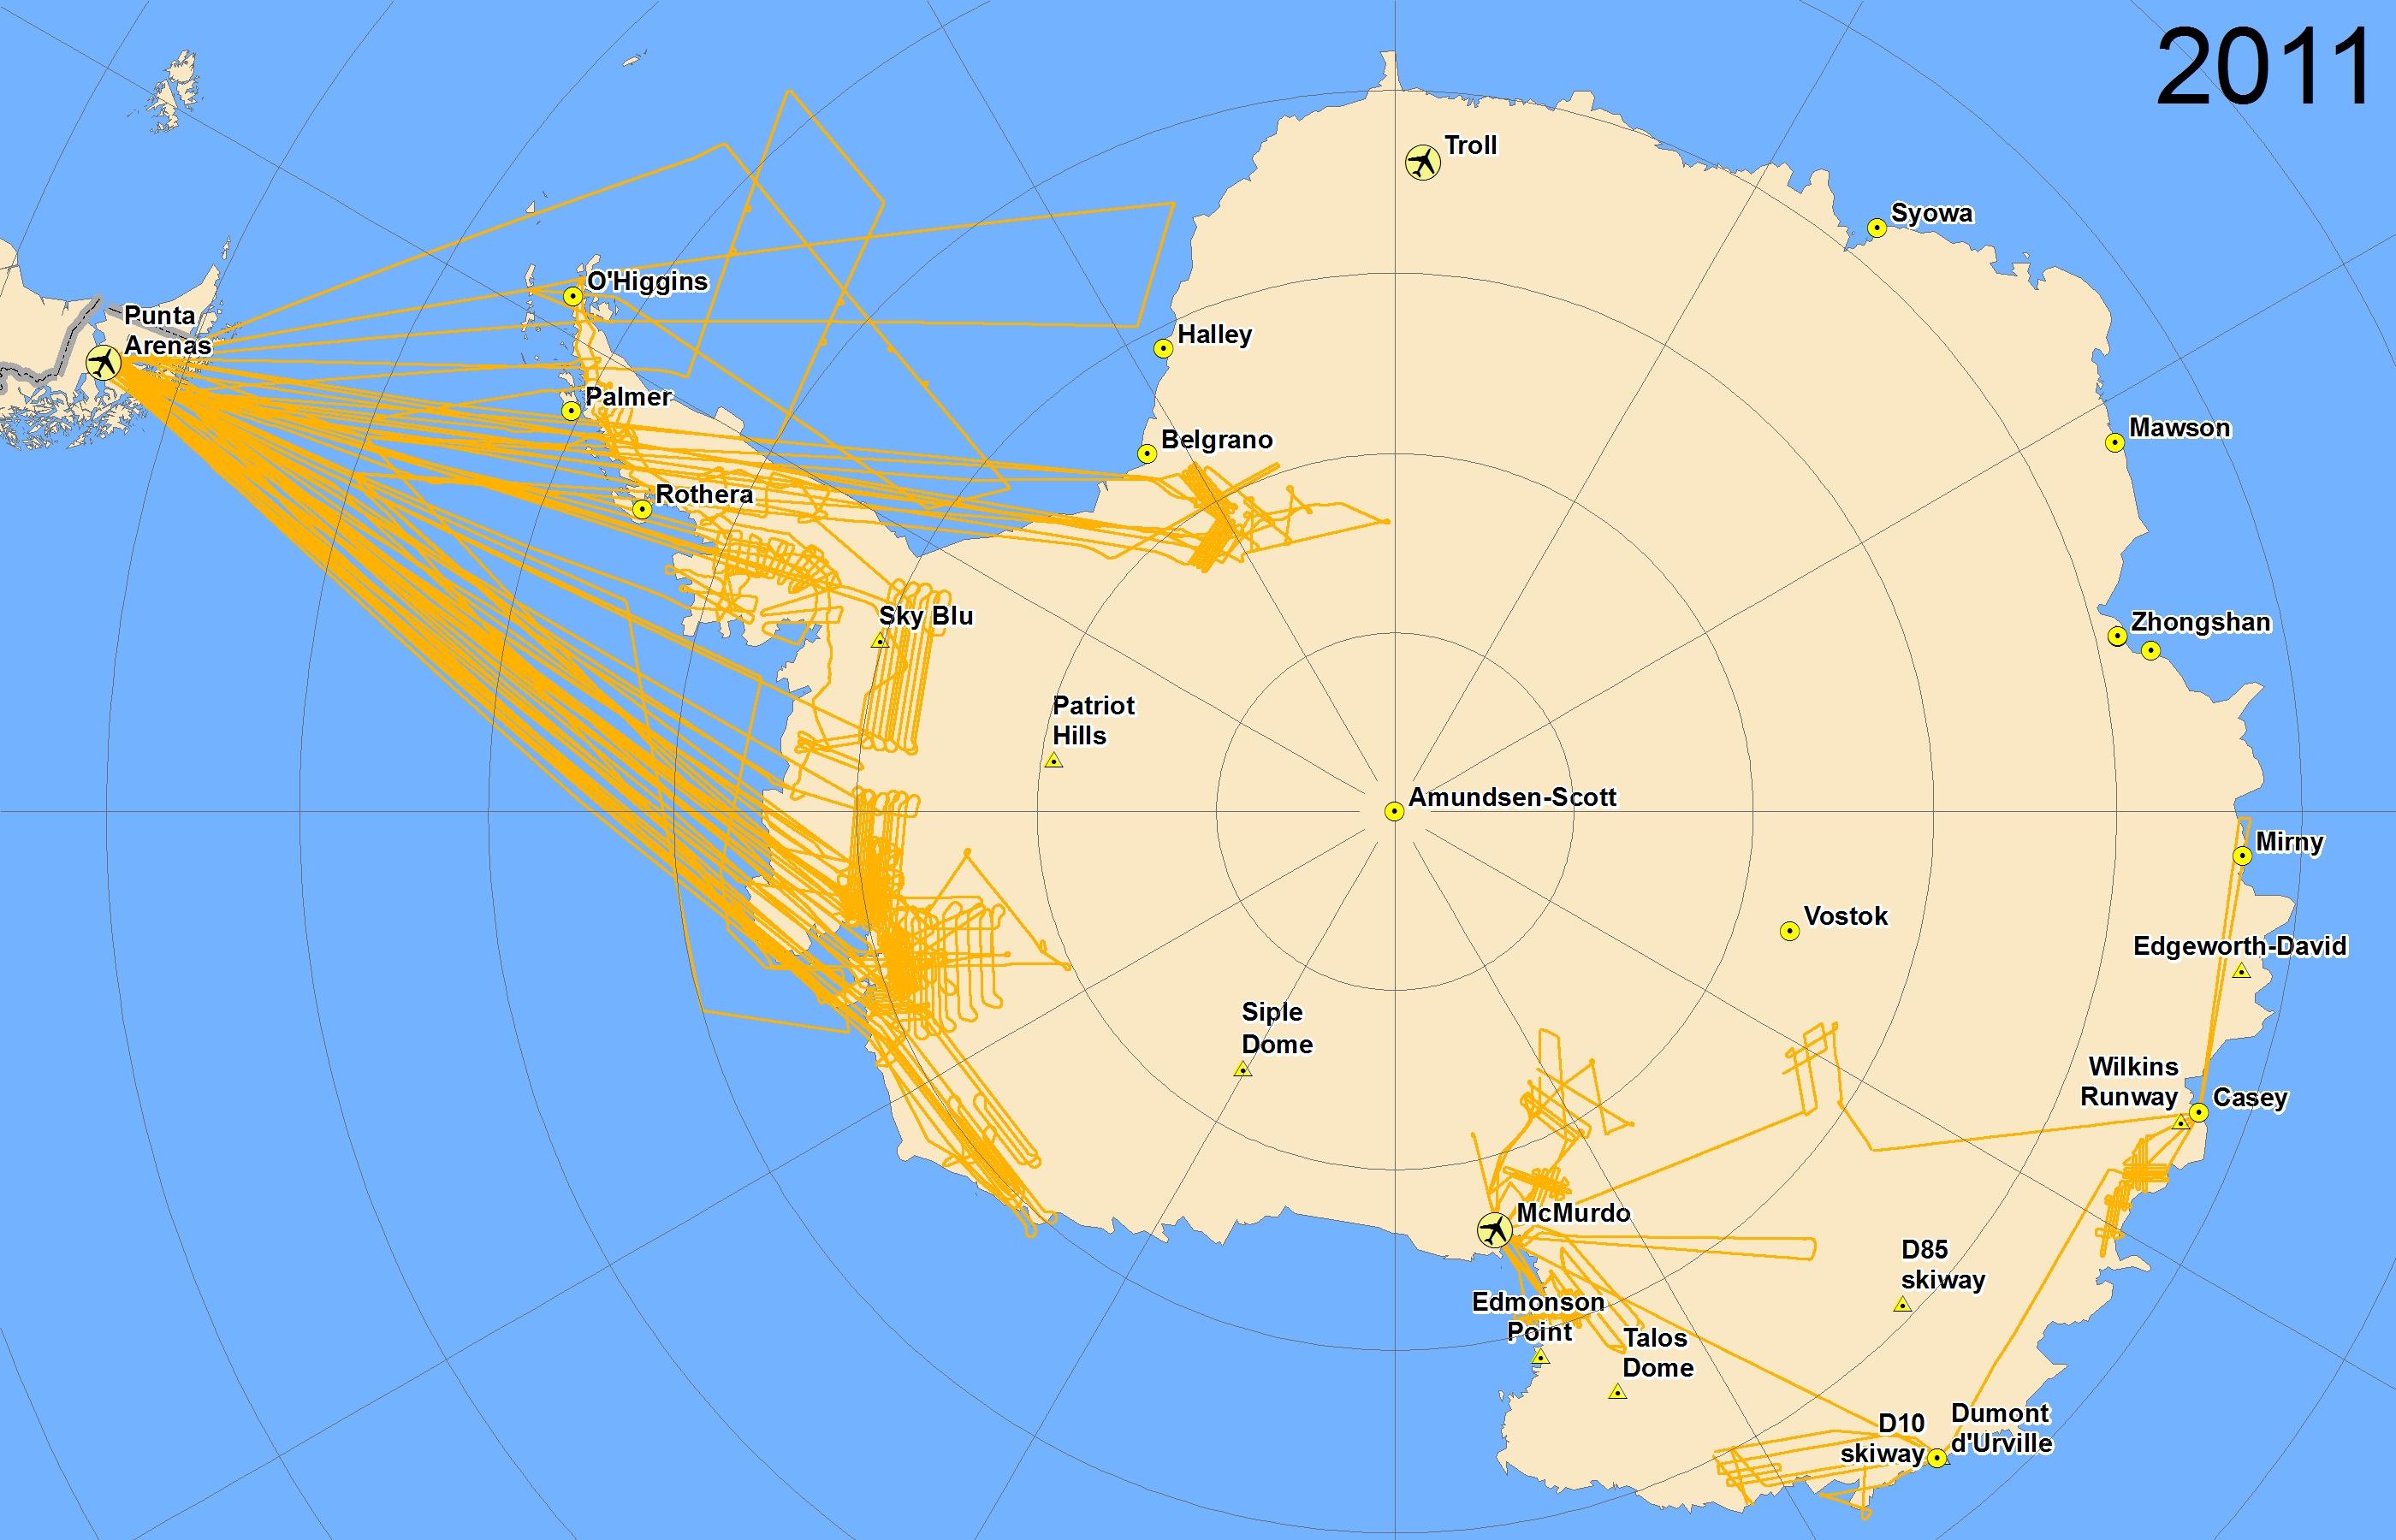 Map of 2011 Antarctic flight lines